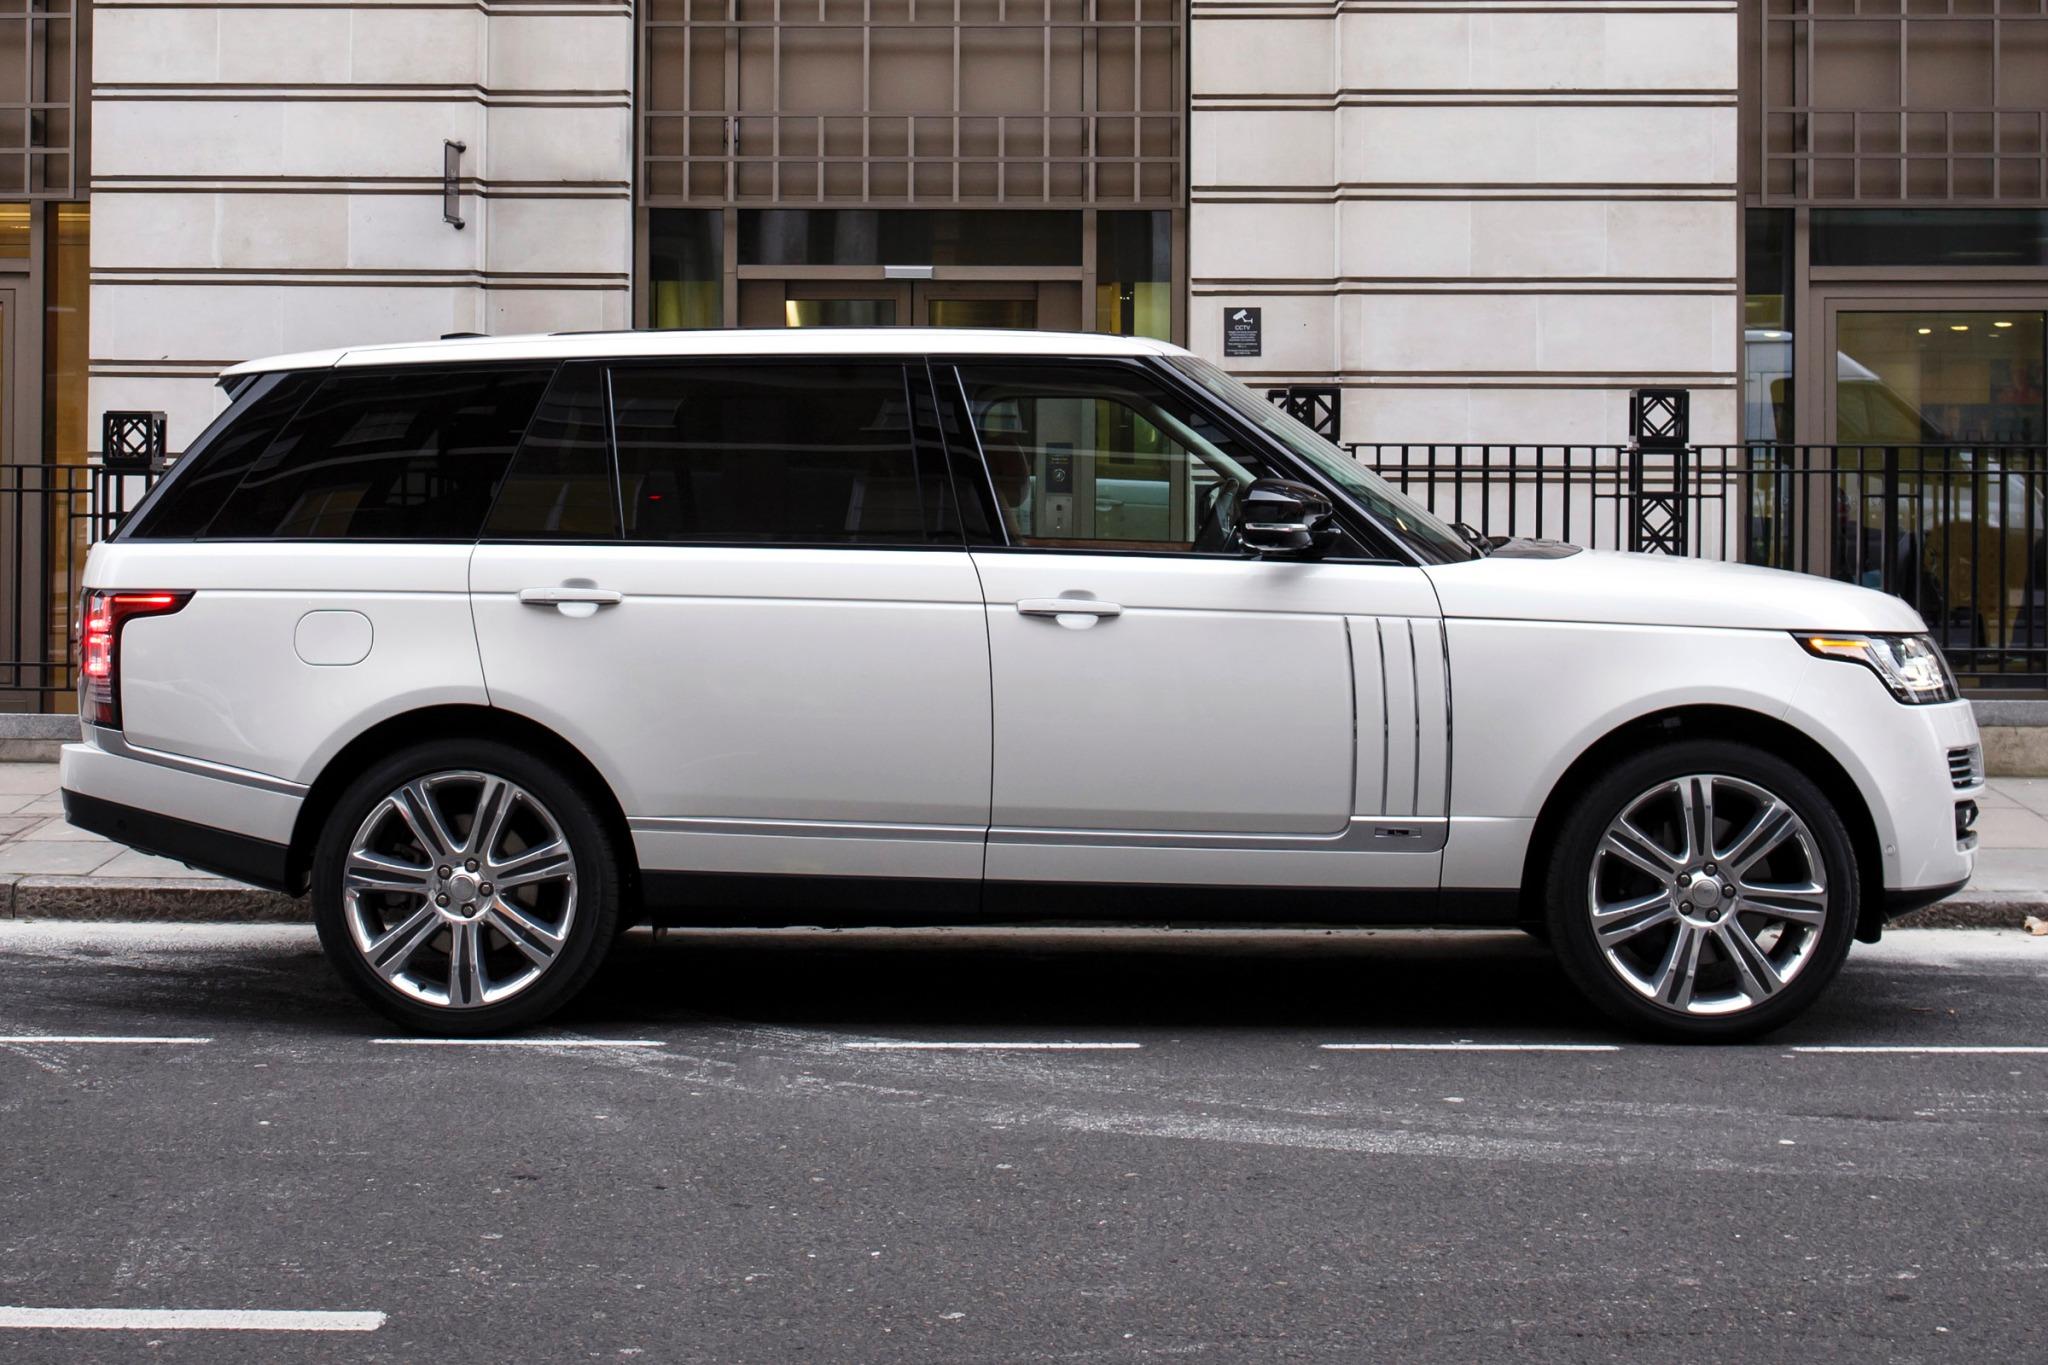 2014 Range Rover >> 2014 LAND ROVER RANGE ROVER - Image #3